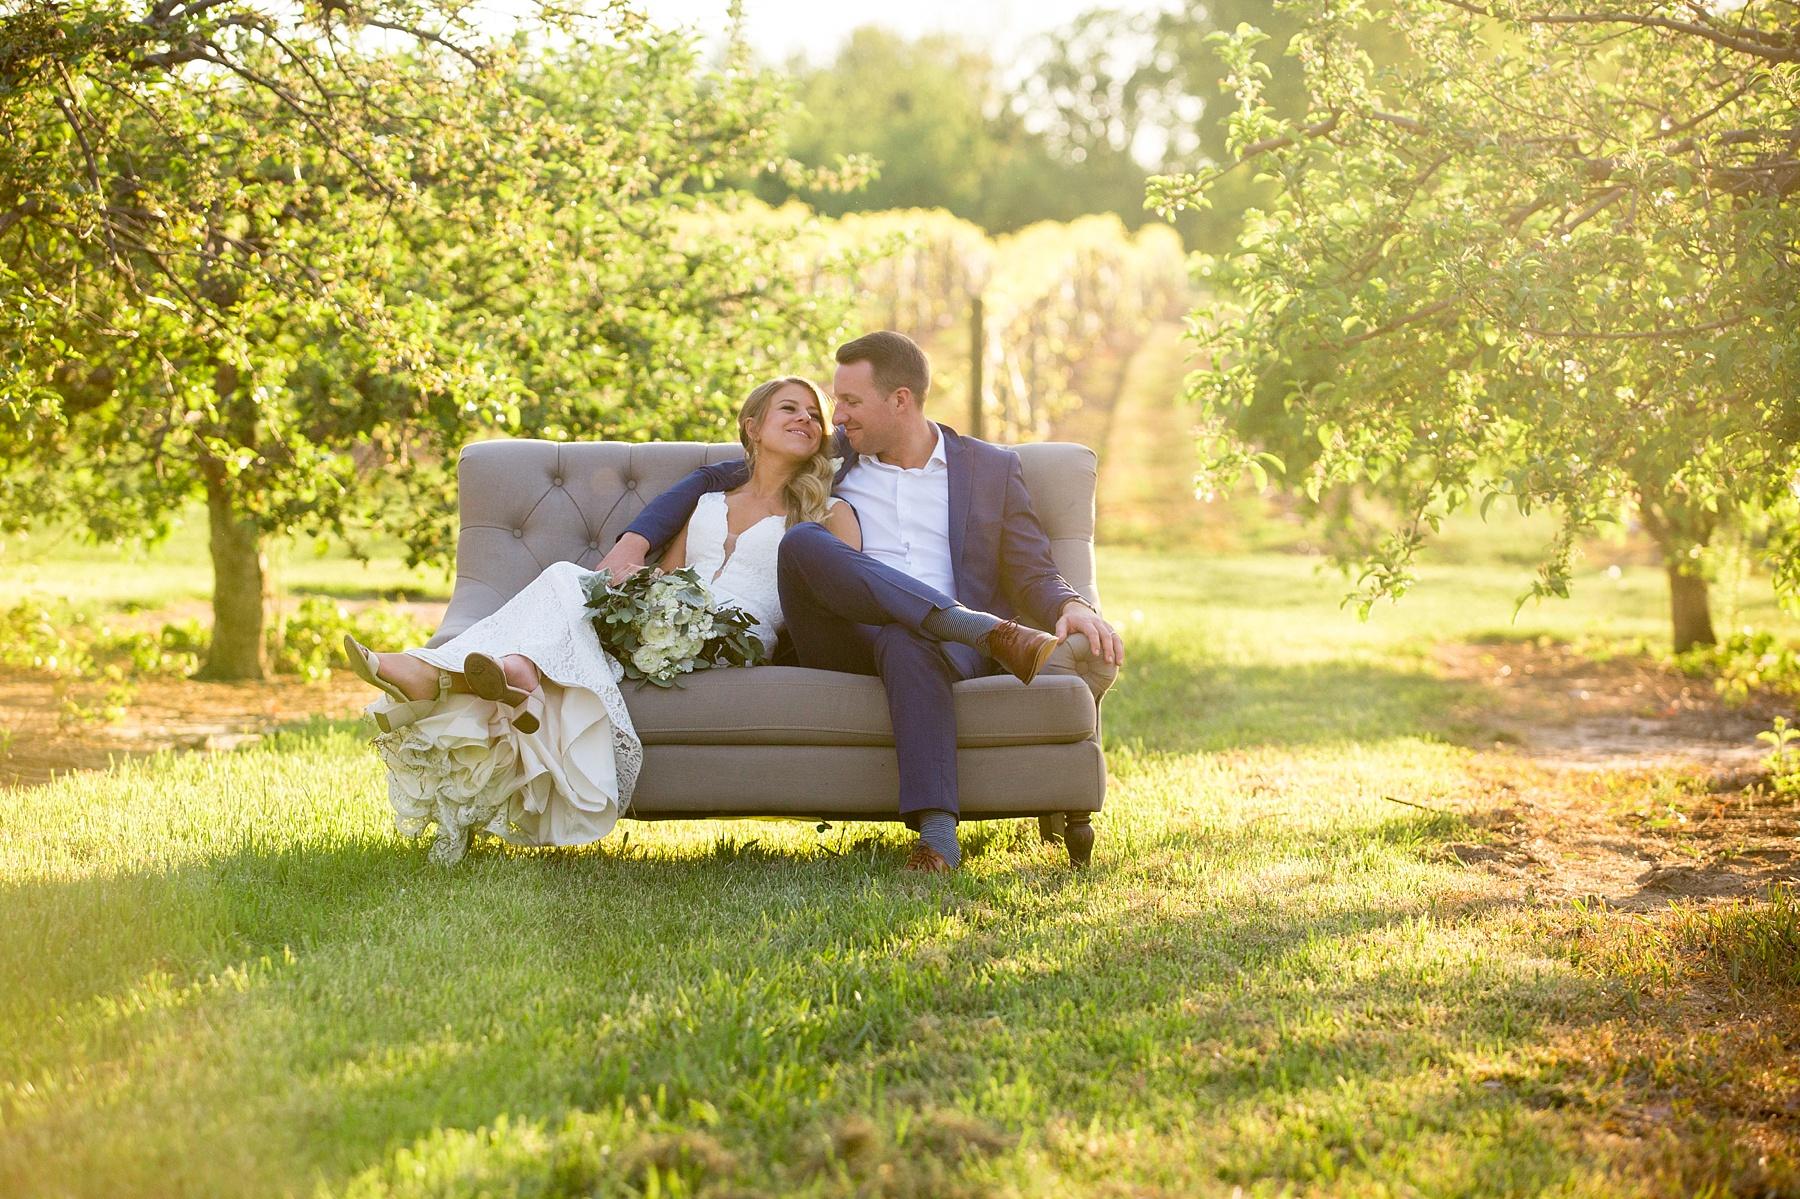 Brandon_Shafer_Photography_Kara_Doug_12_corners_Wedding_Benton_Harbor_0073.jpg